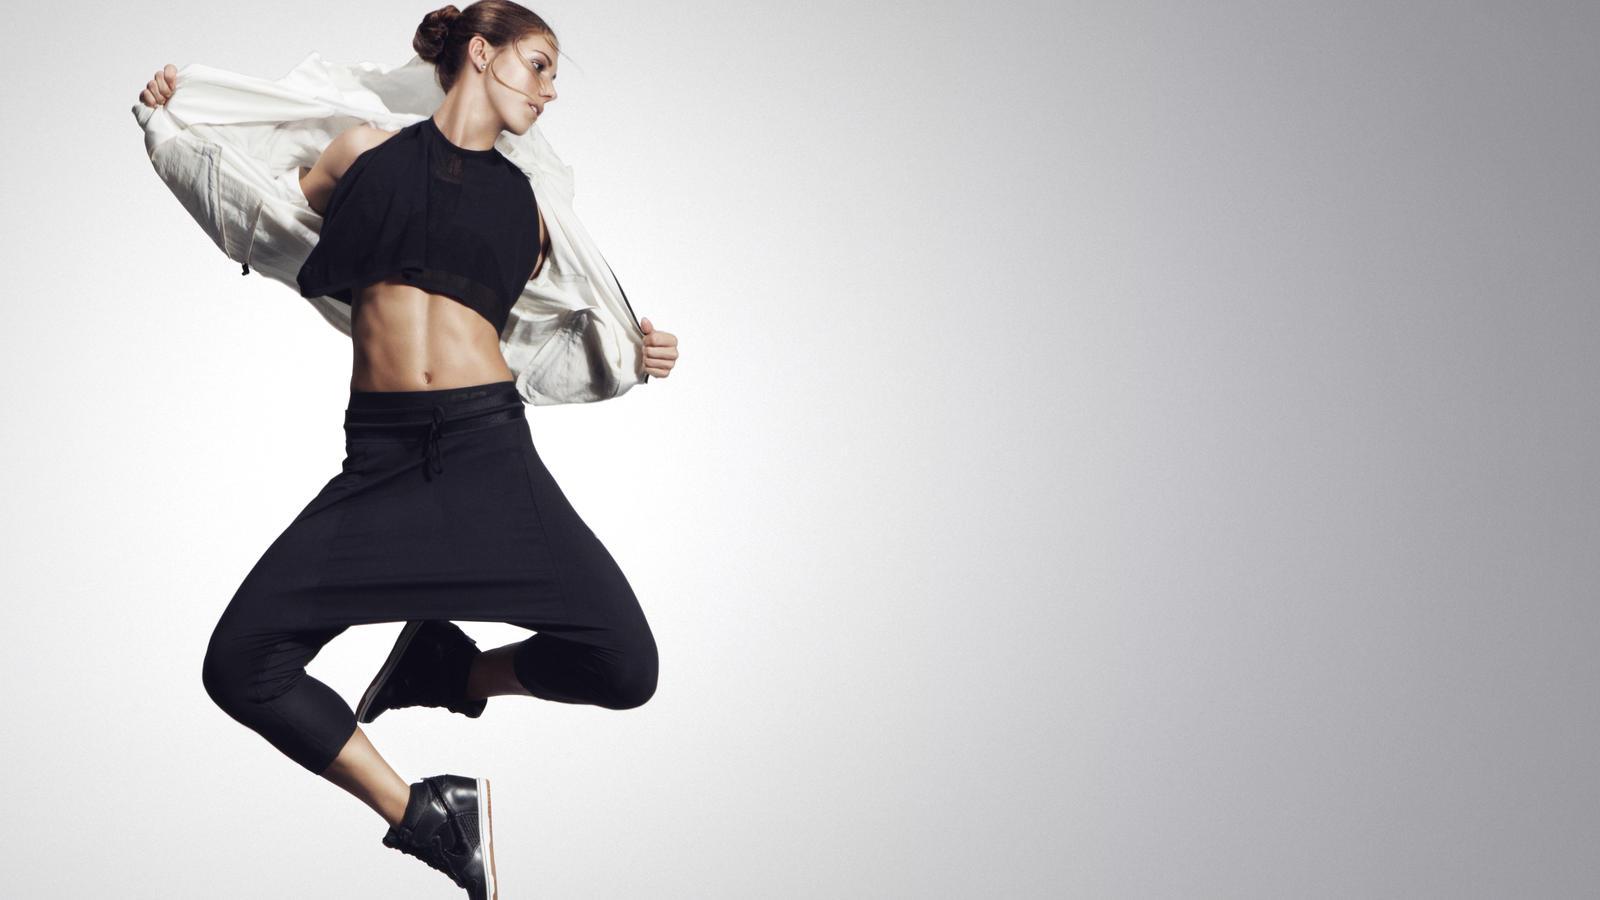 Alex Morgan in Nike Women's Spring/Summer 2013 Look Book